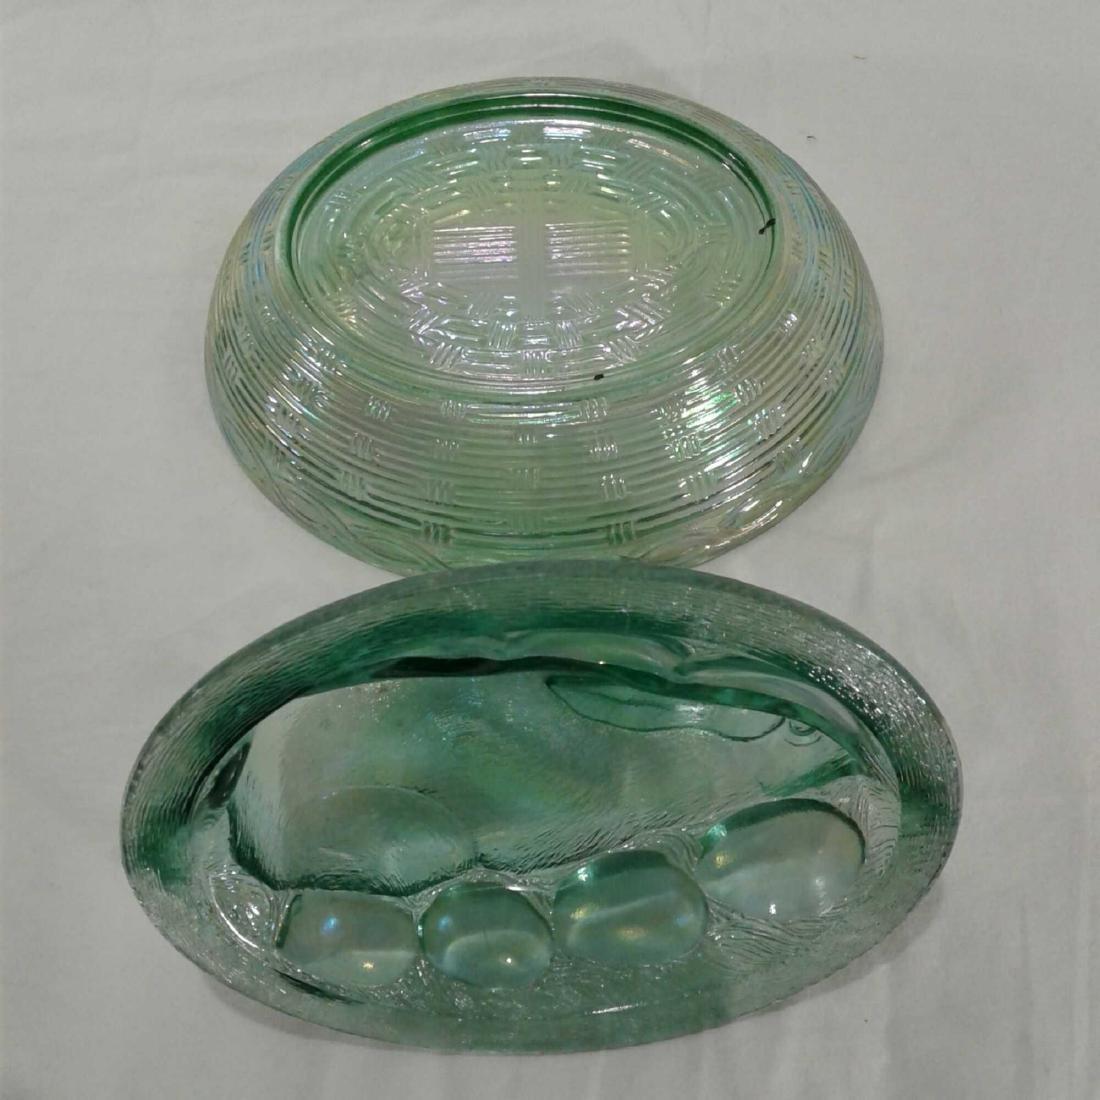 Green Carnival Glass Bunny Rabbit Dish Libbey - 6